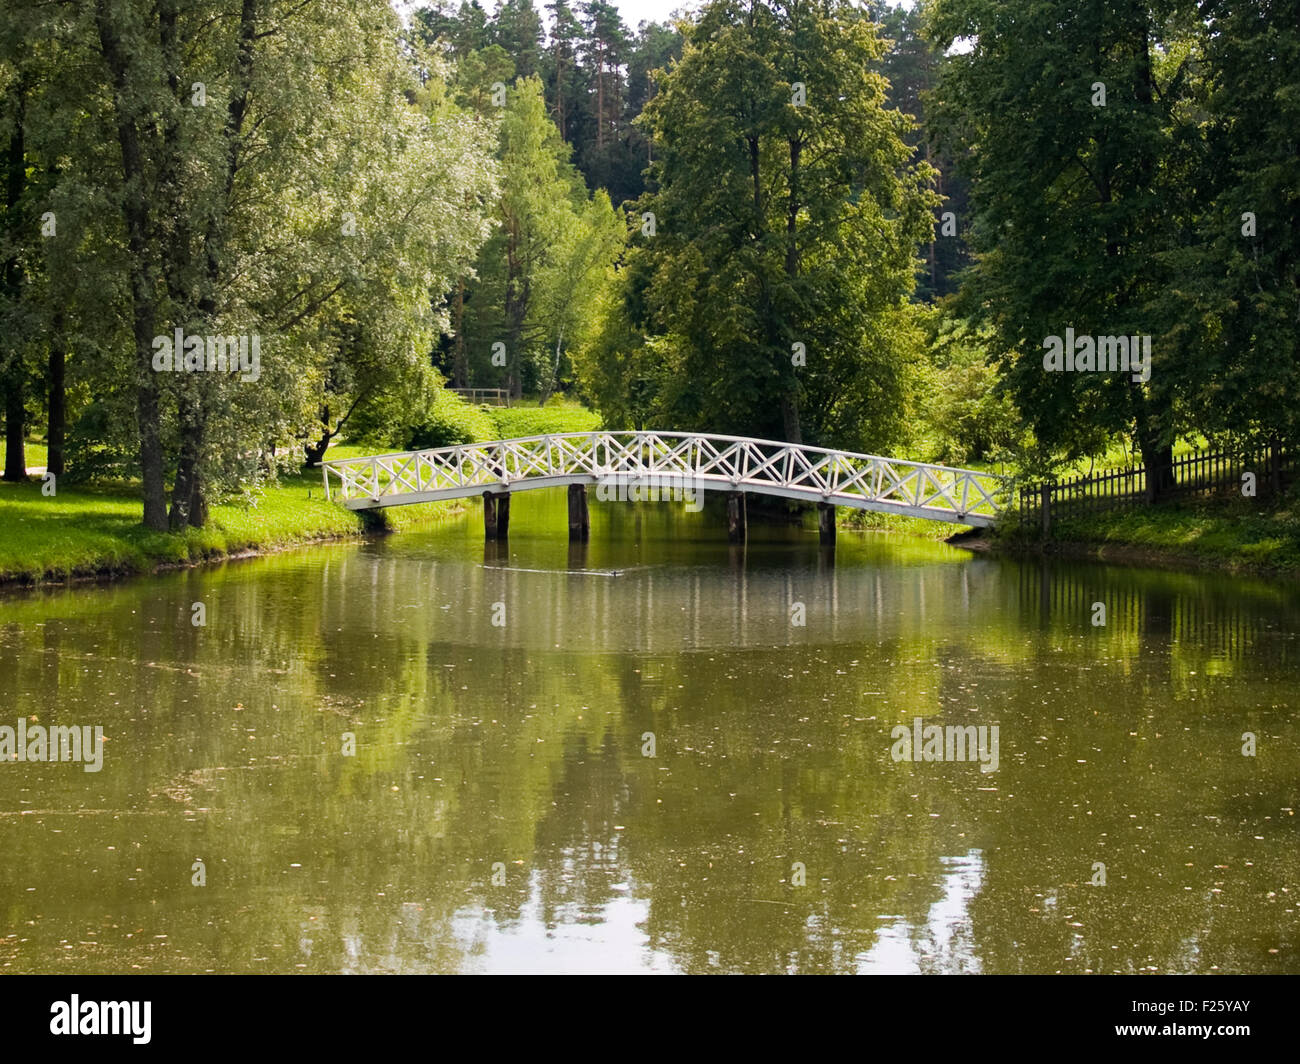 The humpbacked bridge in Mikhailovskoye where Pushkin was in exile - Stock Image